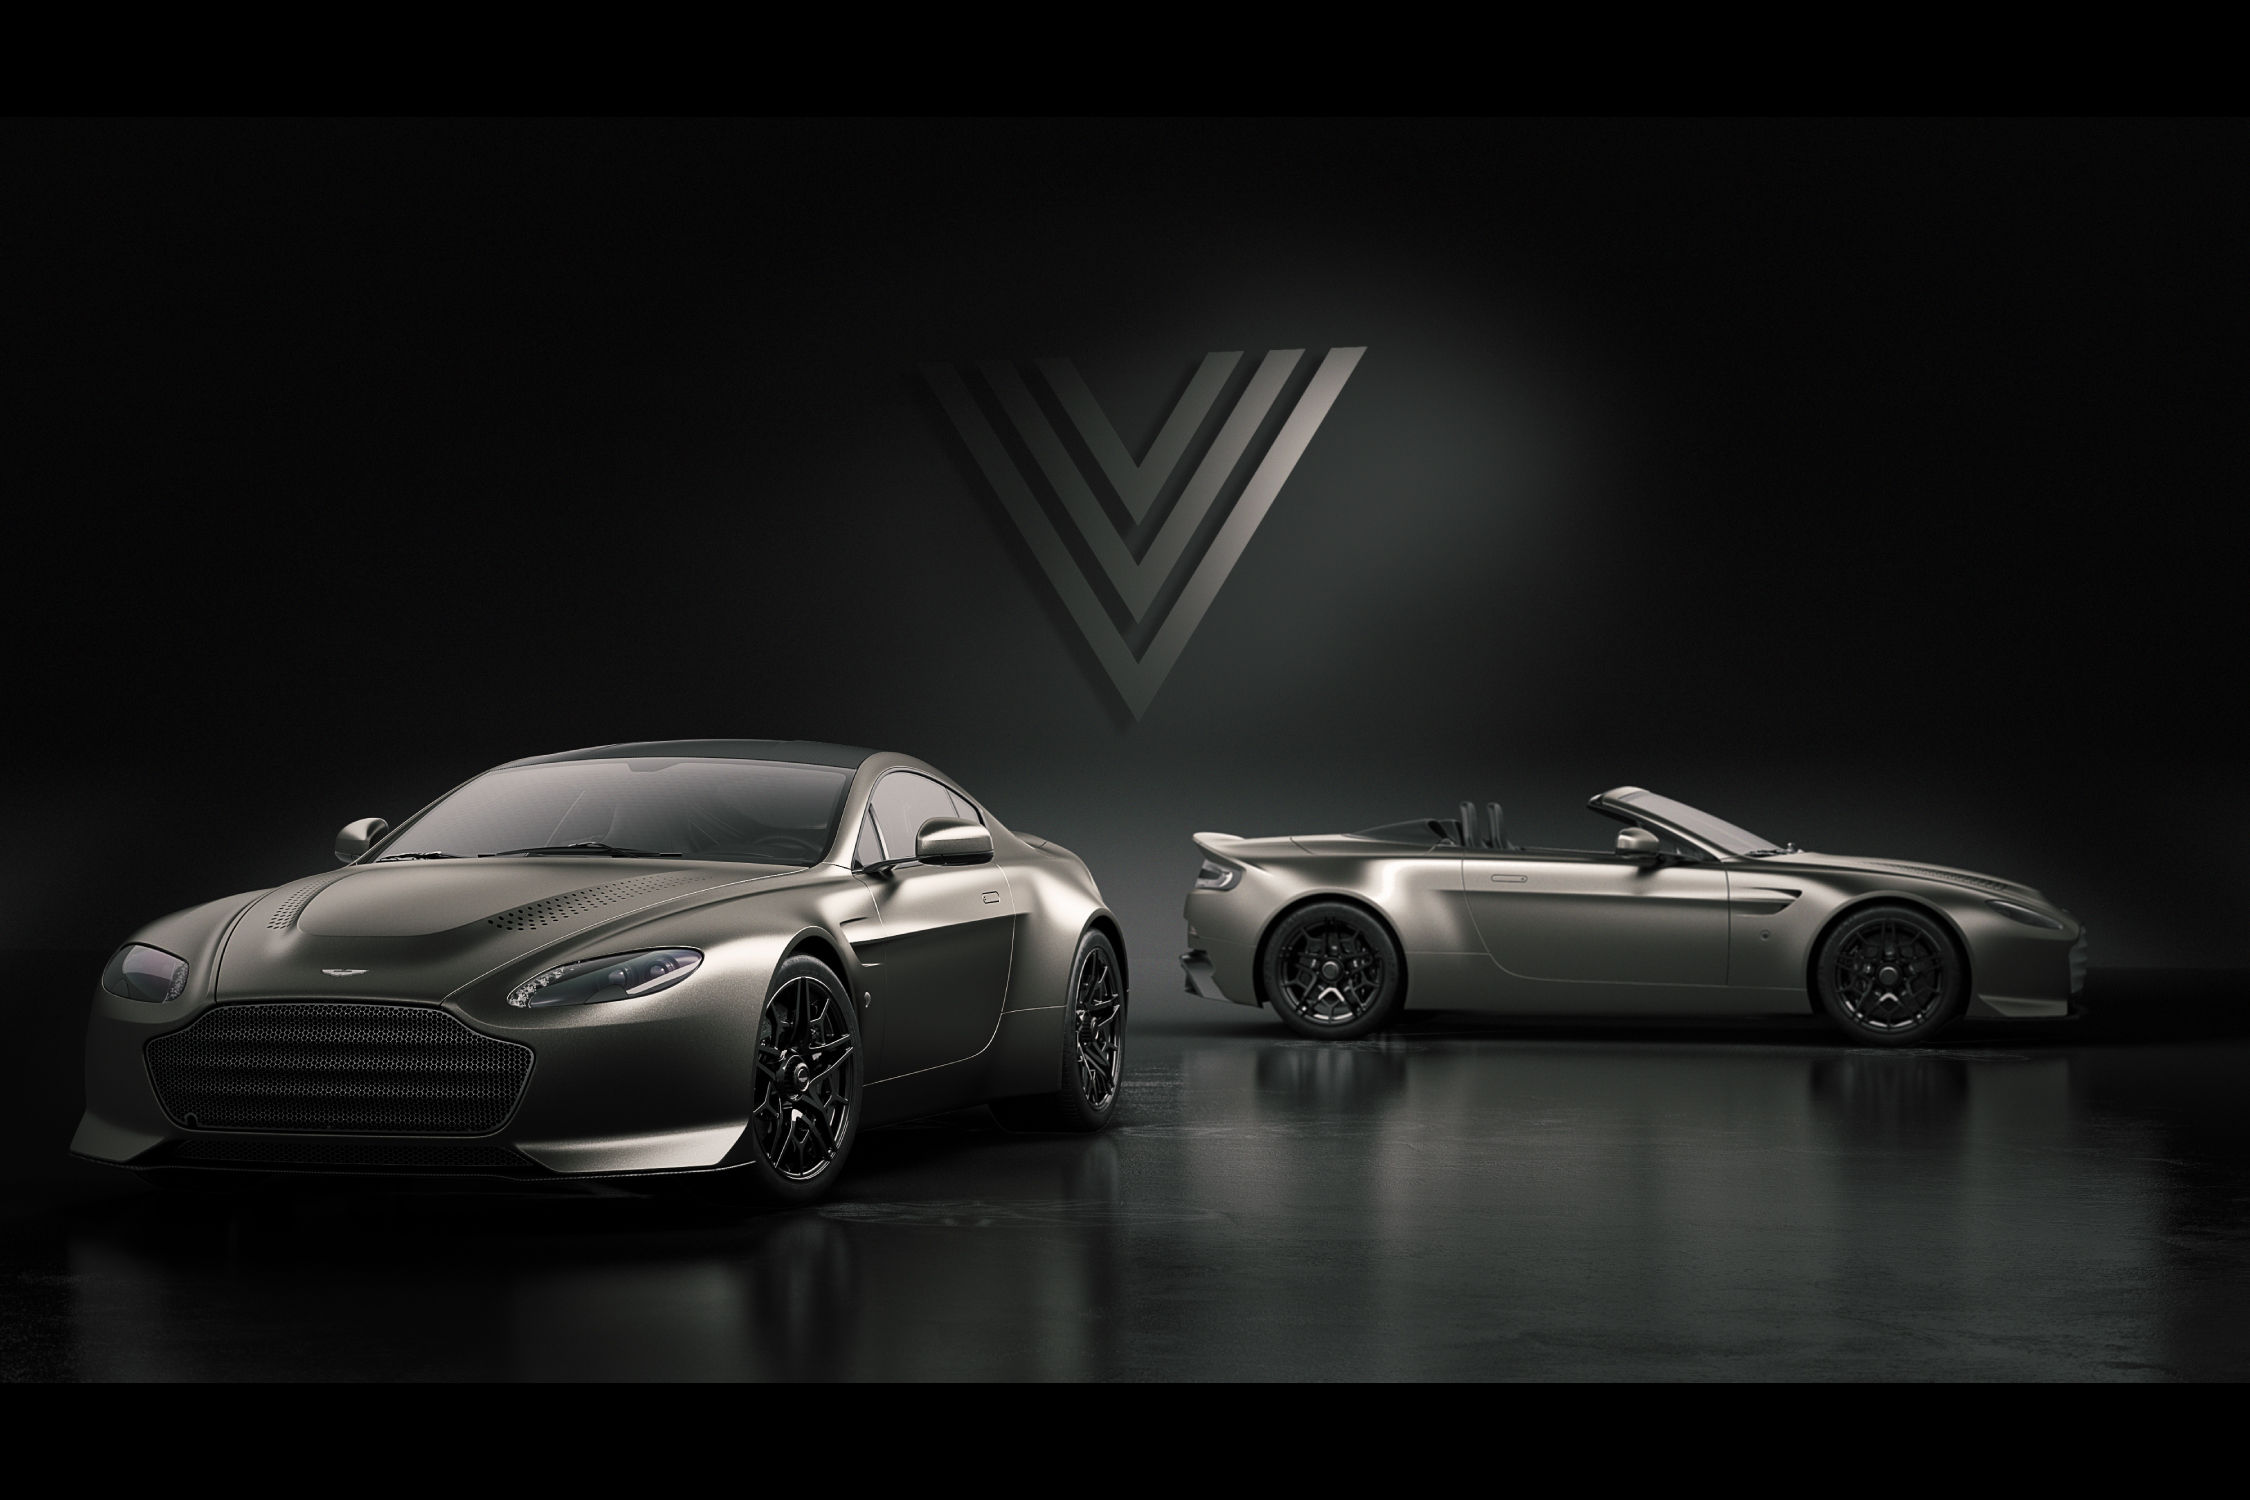 Aston Martin présente la V12 Vantage V600